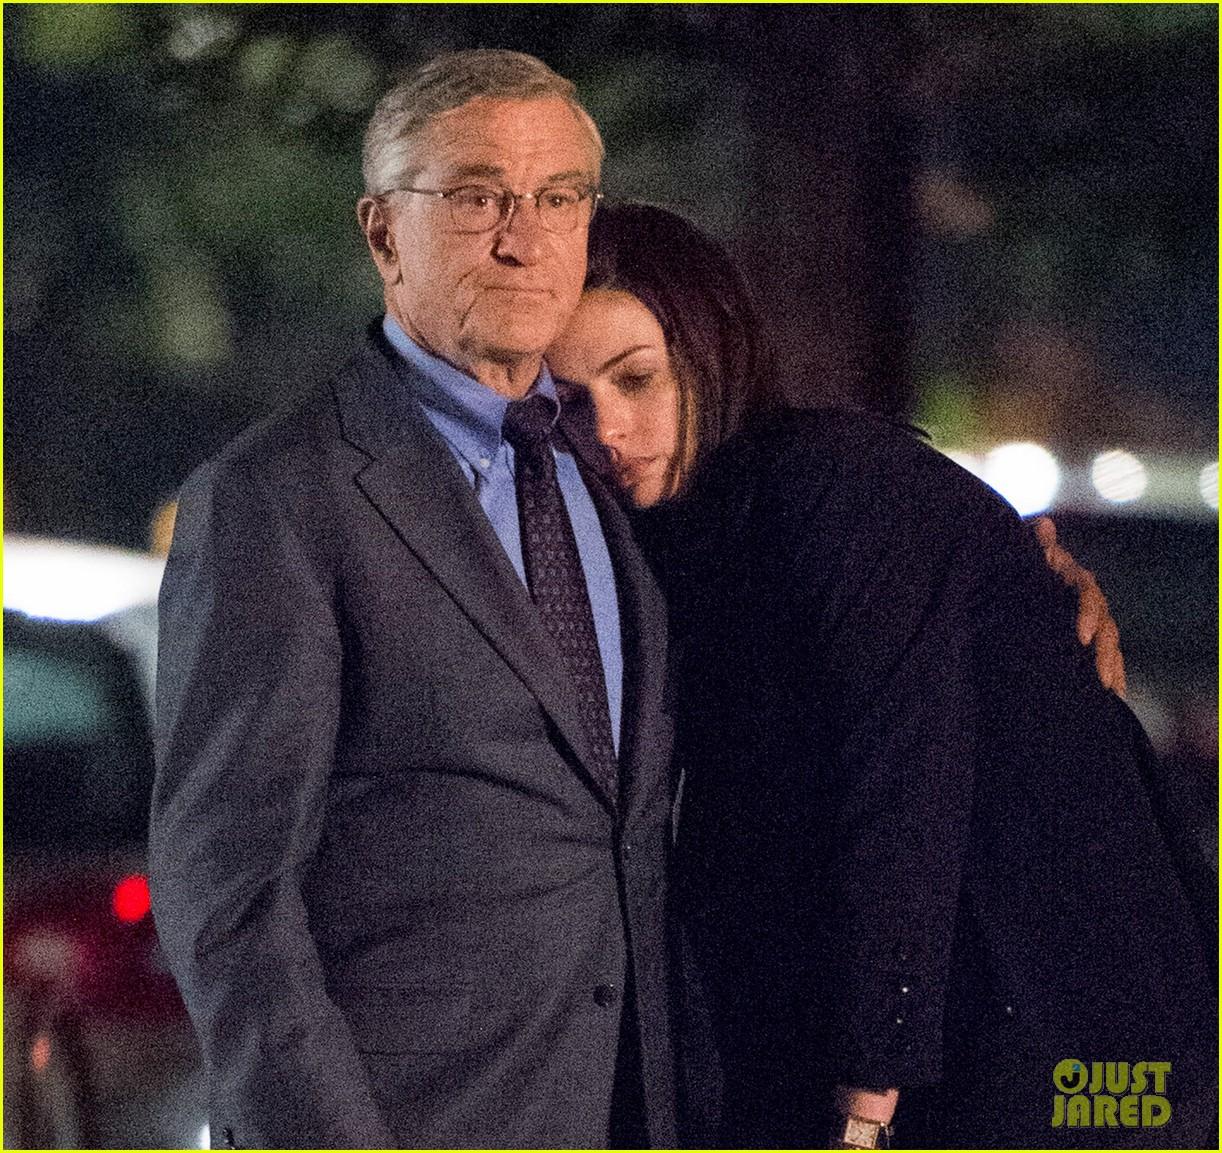 Anne Hathaway Robert De Niro Movie: Robert De Niro Holds Back Anne Hathaway's Hair While